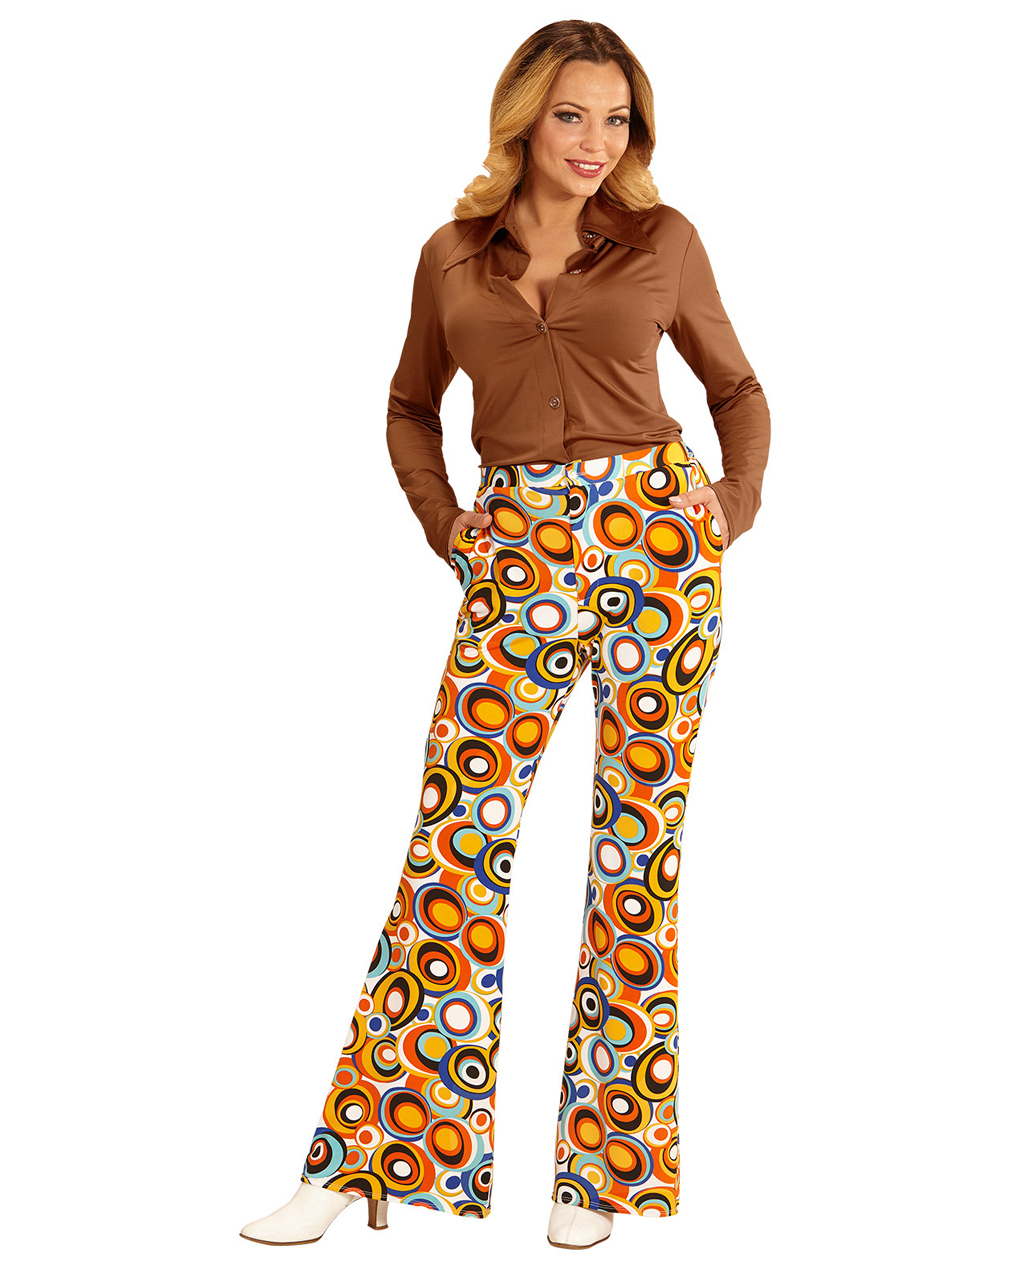 956e101eefa Groovy 70`s Women s Trousers Bubbles for theme parties